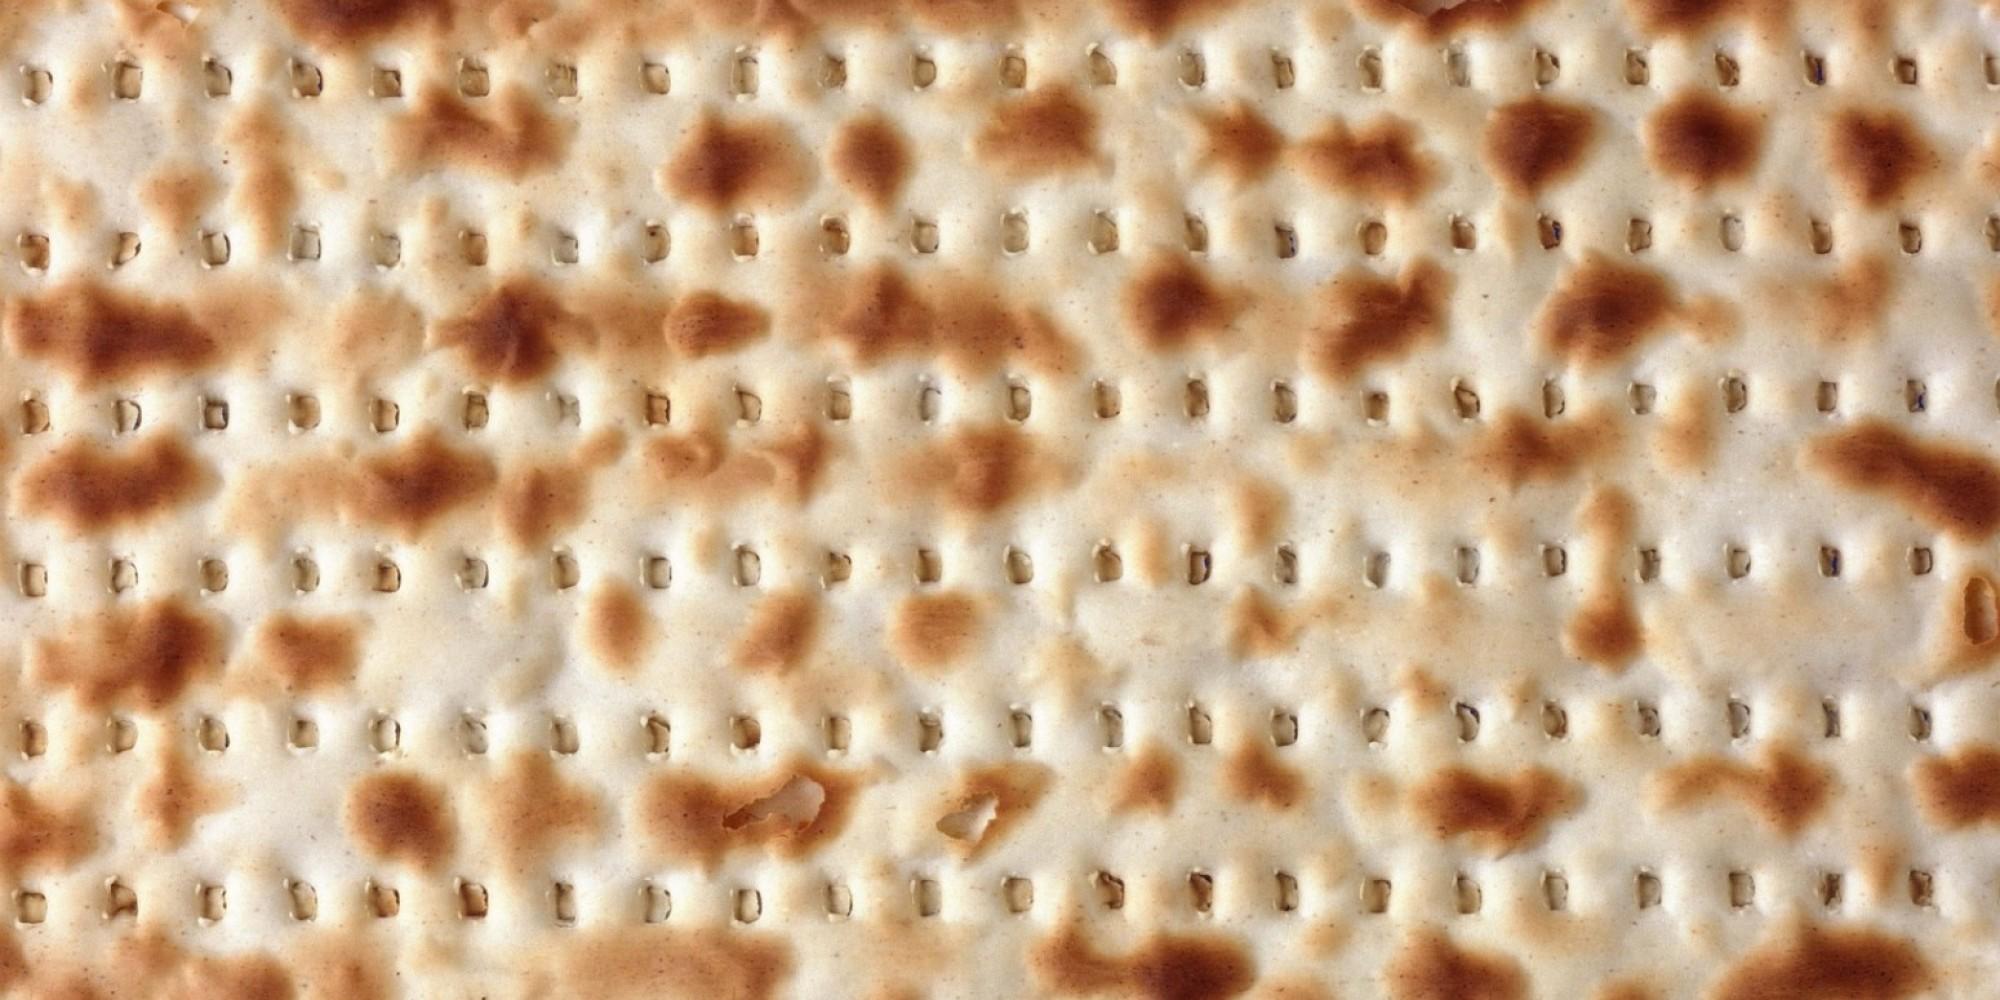 Finding Business Wisdom in a Box of Matzah | HuffPost